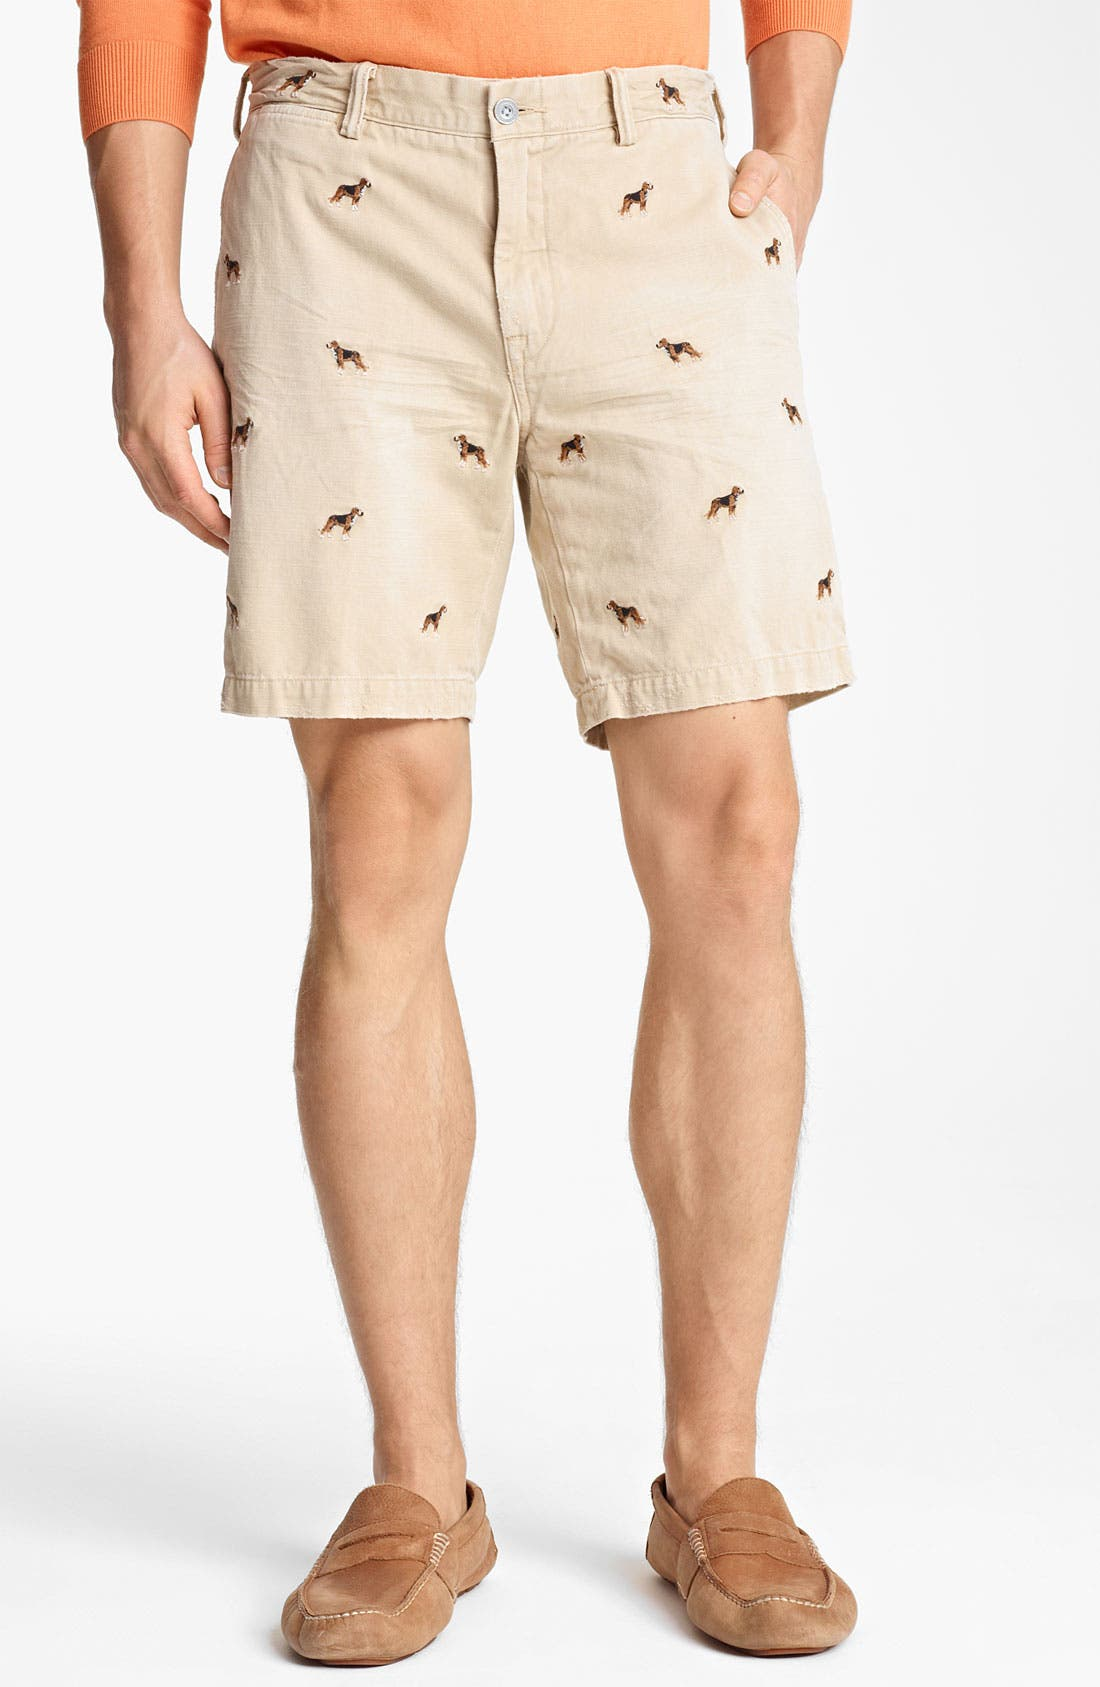 Main Image - Polo Ralph Lauren 'Maritime Beagle' Chino Shorts